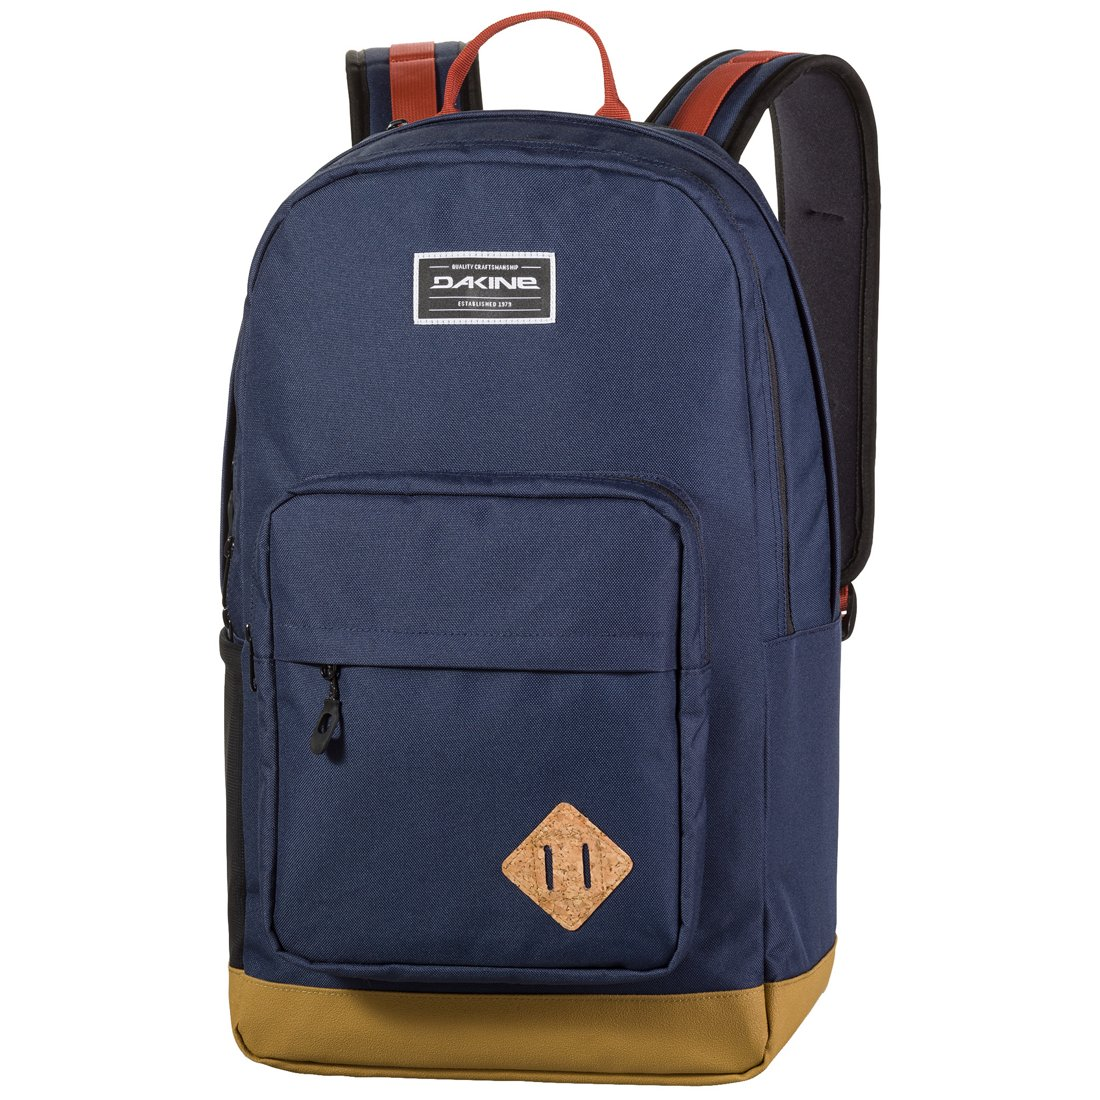 250e0c4b1e986 Dakine Packs   Bags 365 Pack DLX Rucksack 47 cm - koffer-direkt.de